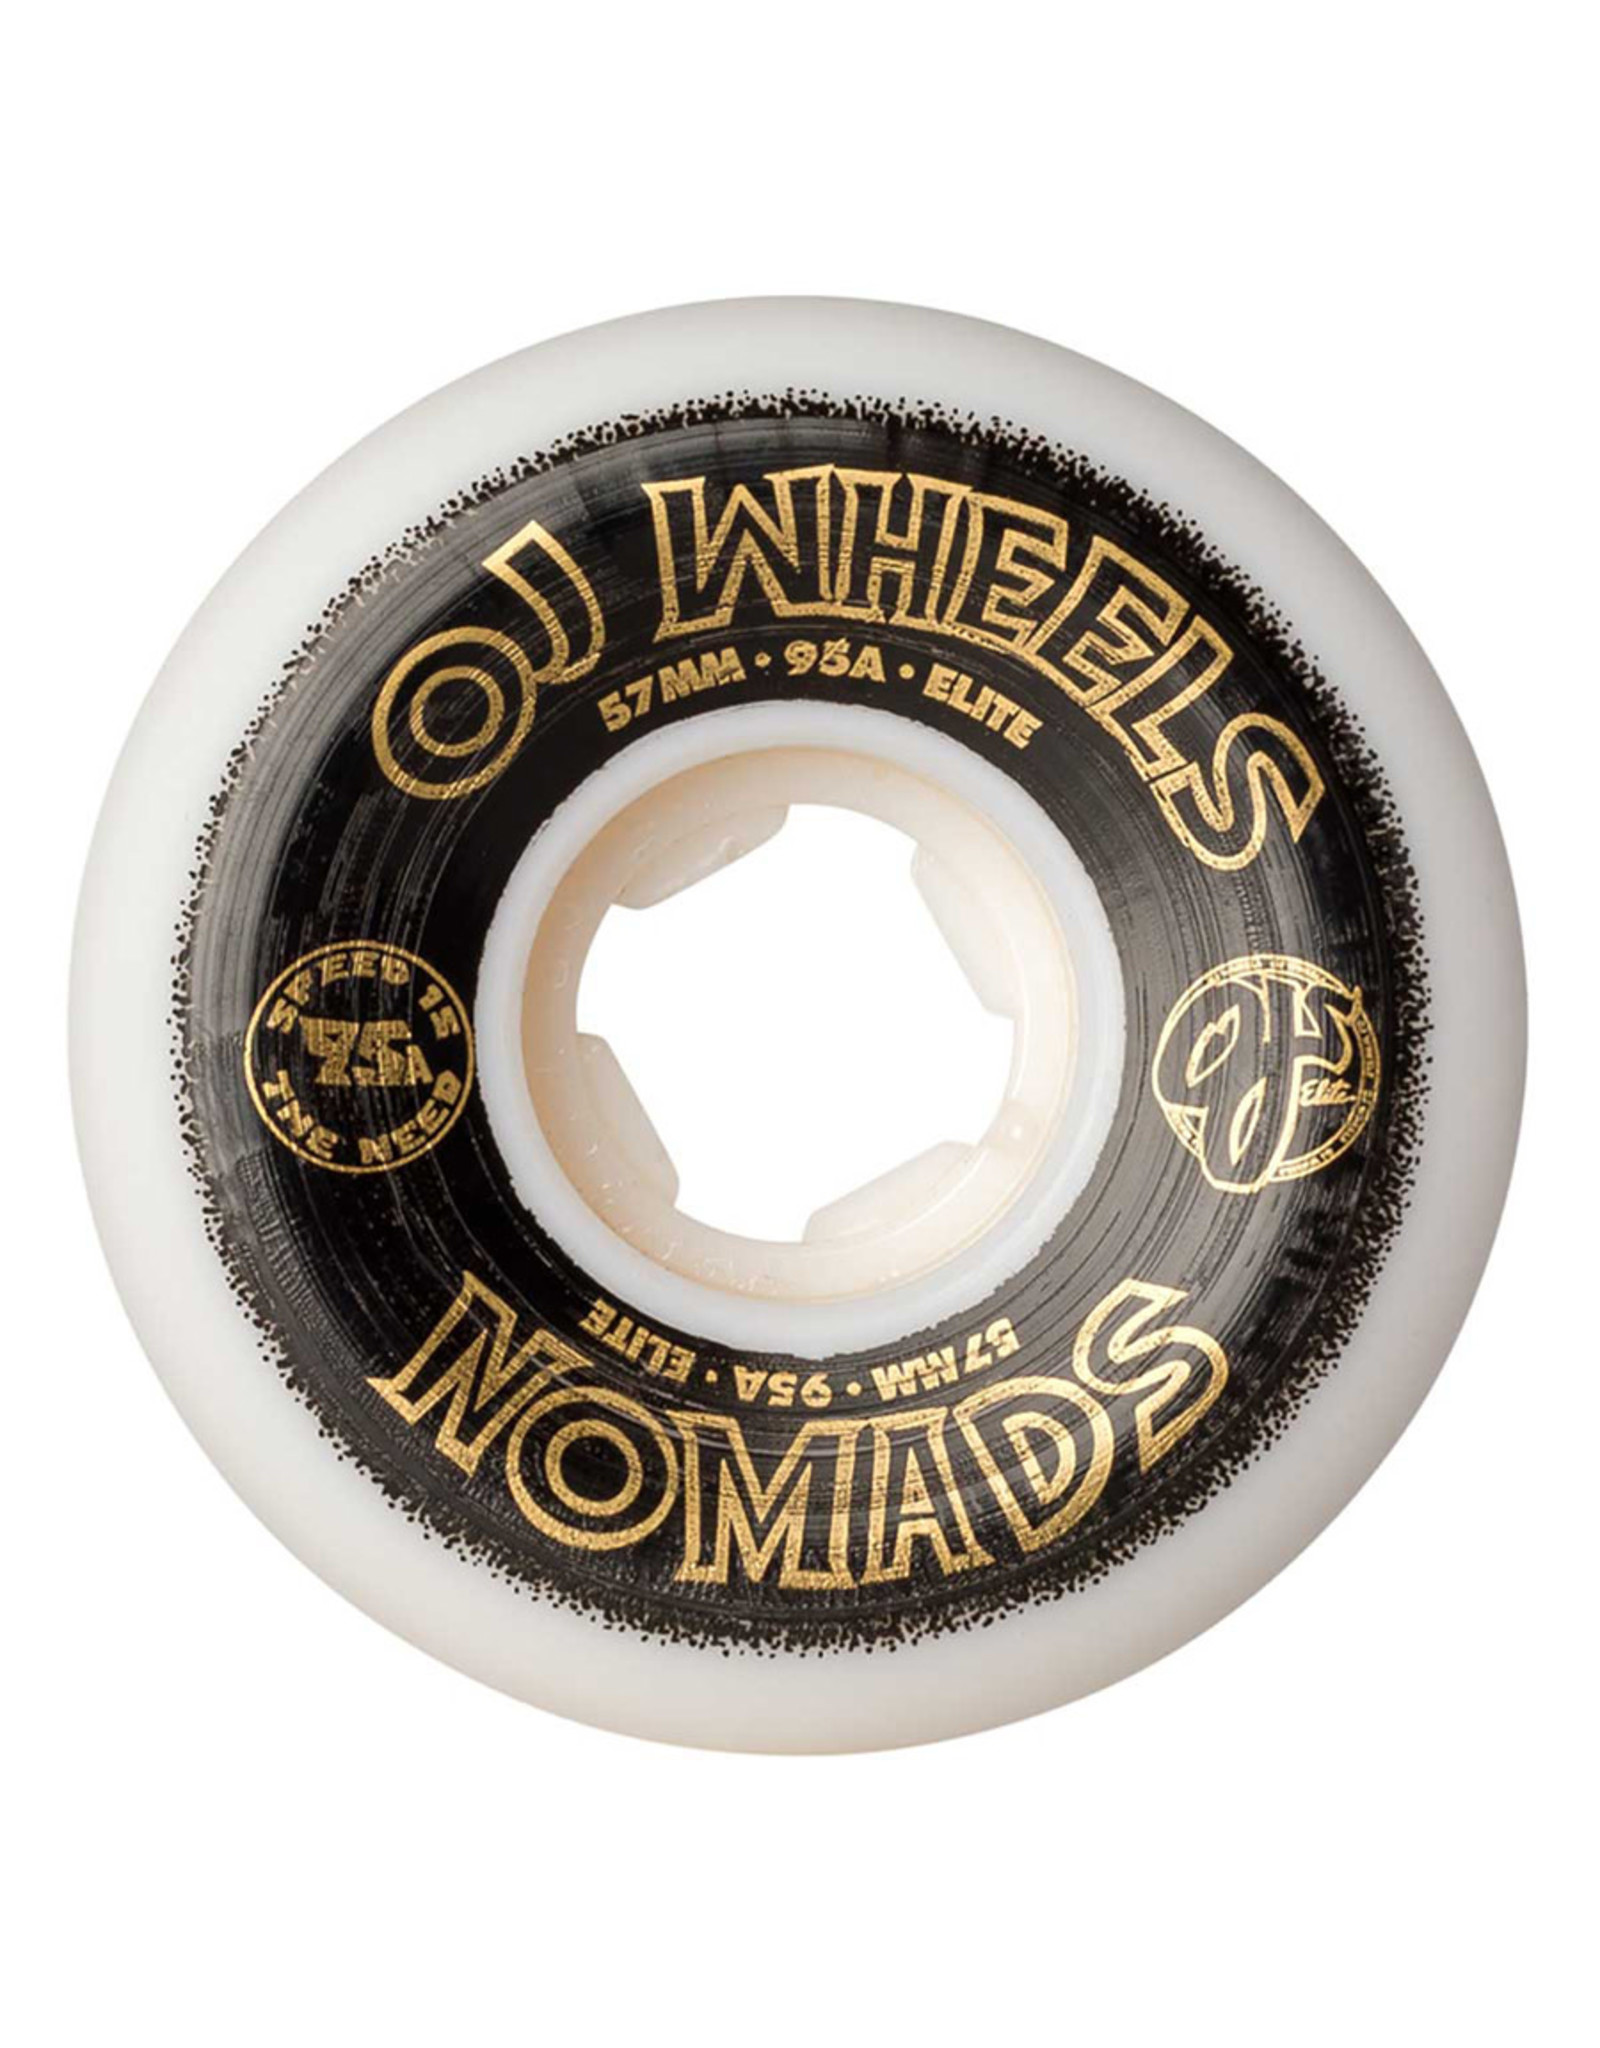 OJ Wheels OJ Wheels Elite Nomads (57mm/95a)